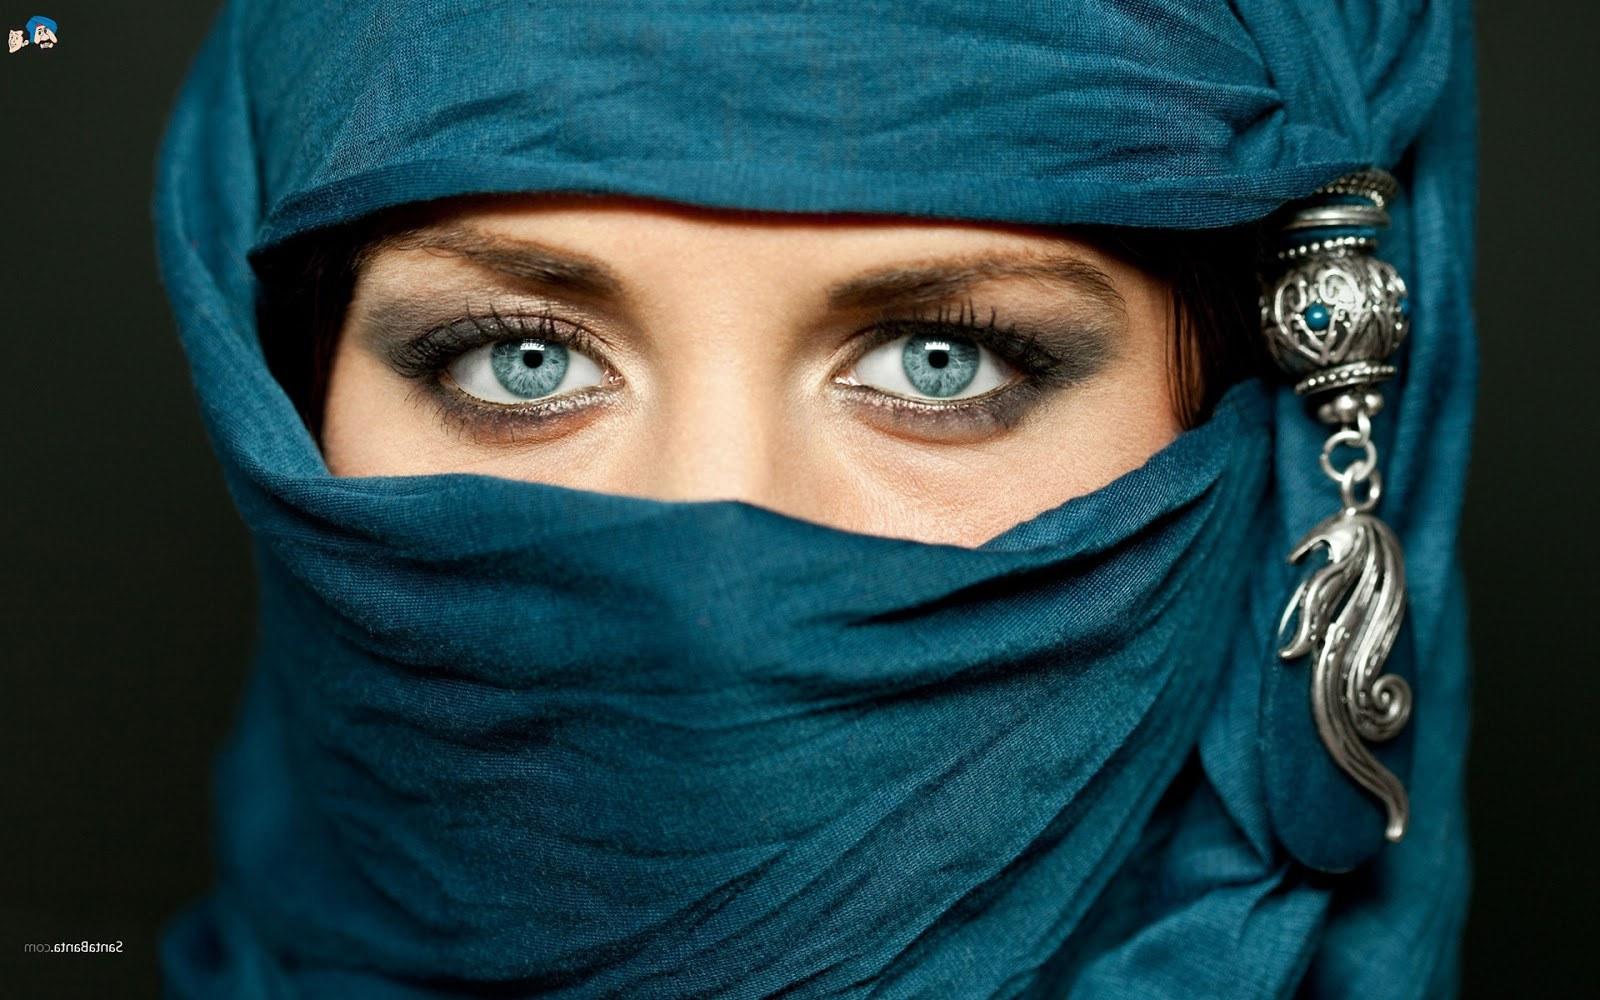 Bentuk Muslimah Bercadar Hitam Dddy Koleksi Wallpaper Wanita Muslimah Bercadar